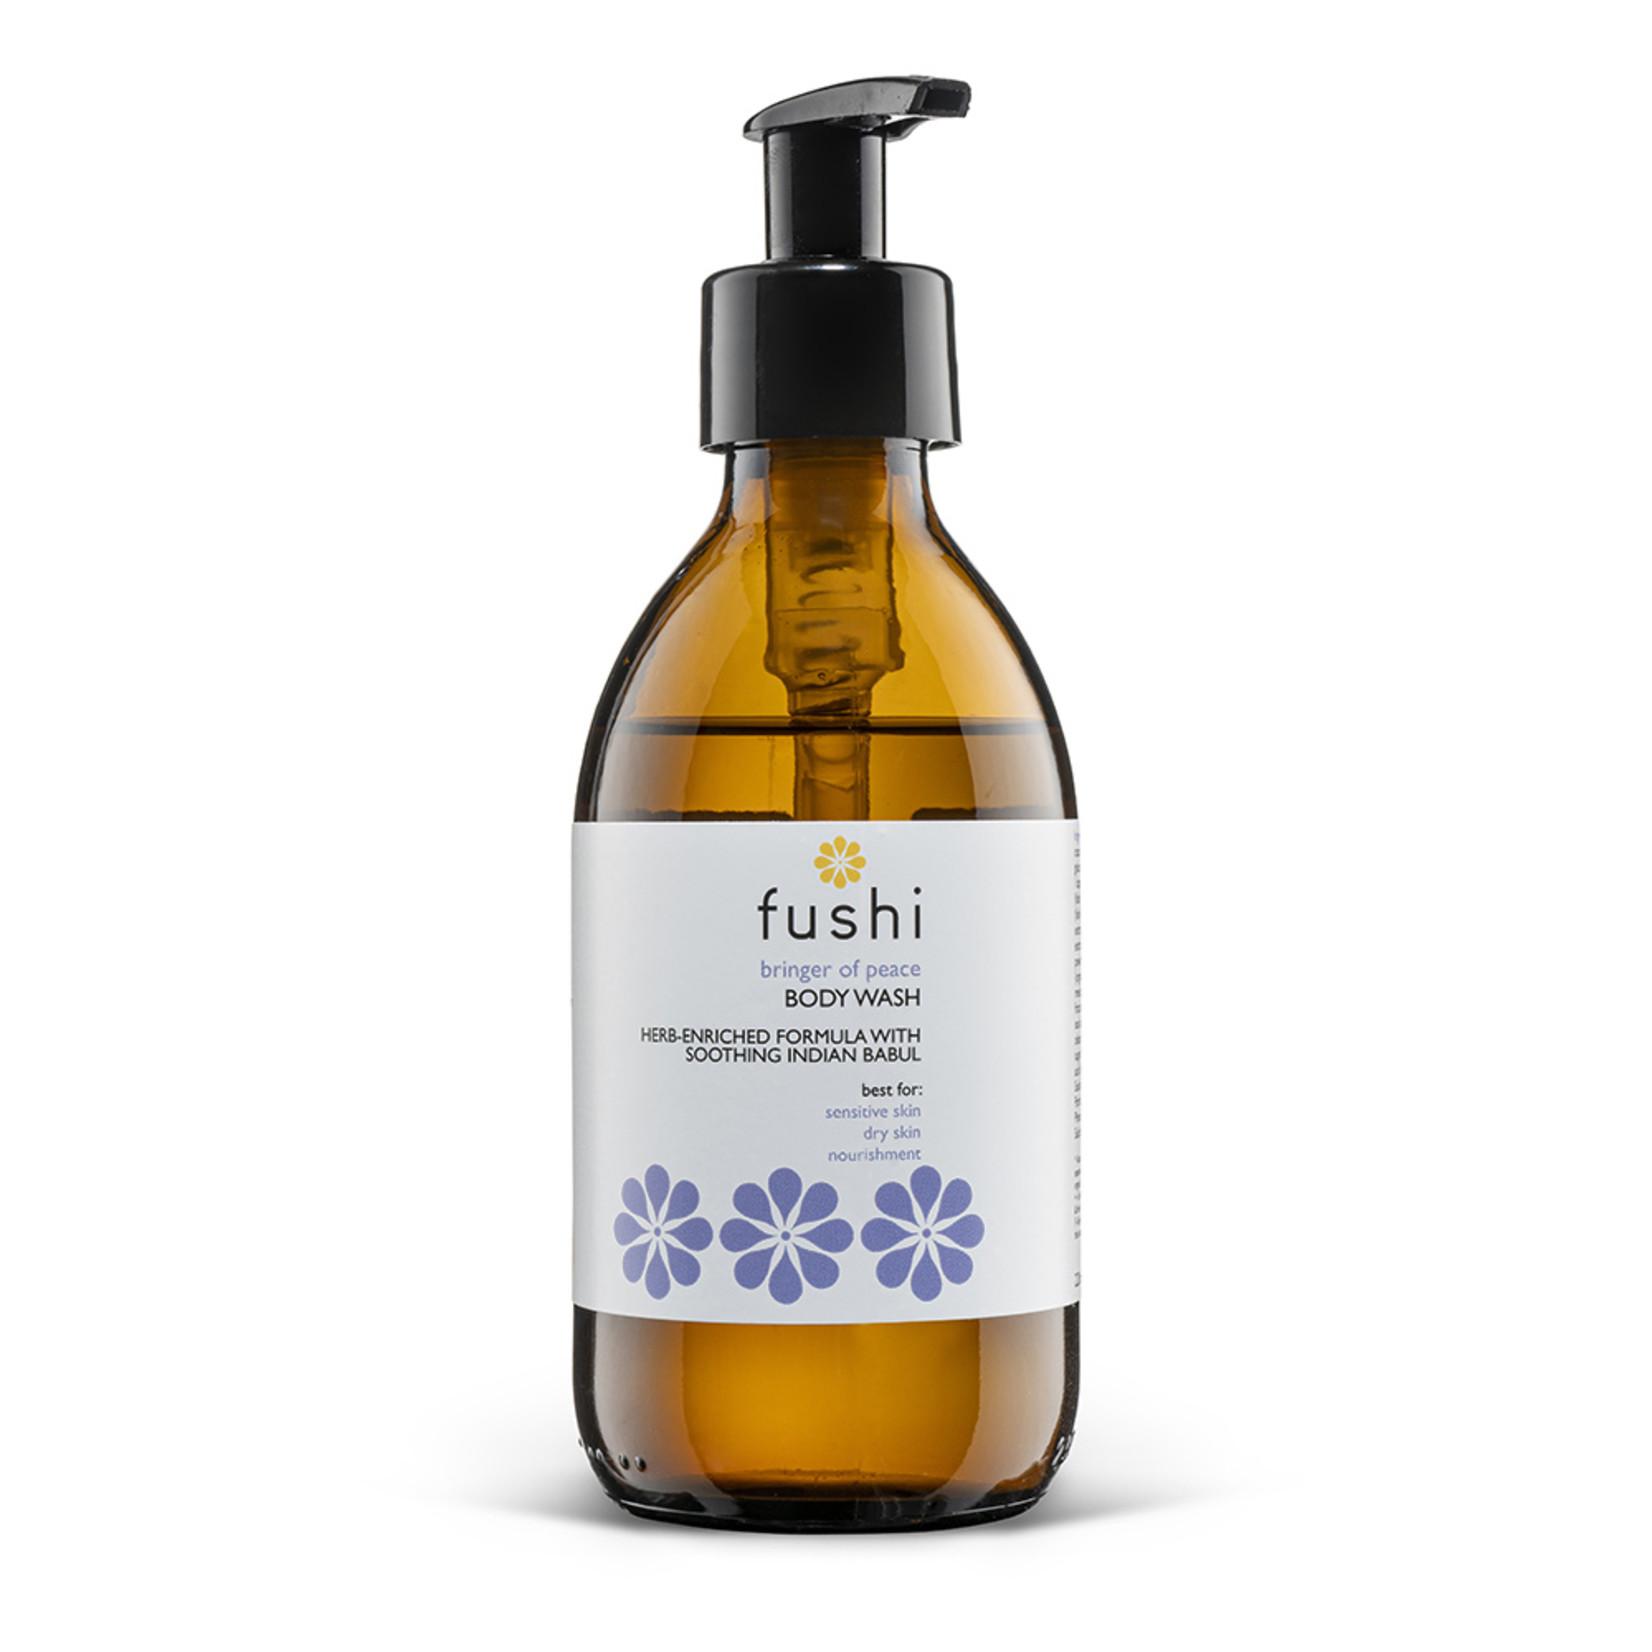 Fushi FUSHI - Bringer of Peace Body Wash - Douche- & Badgel - 230ml